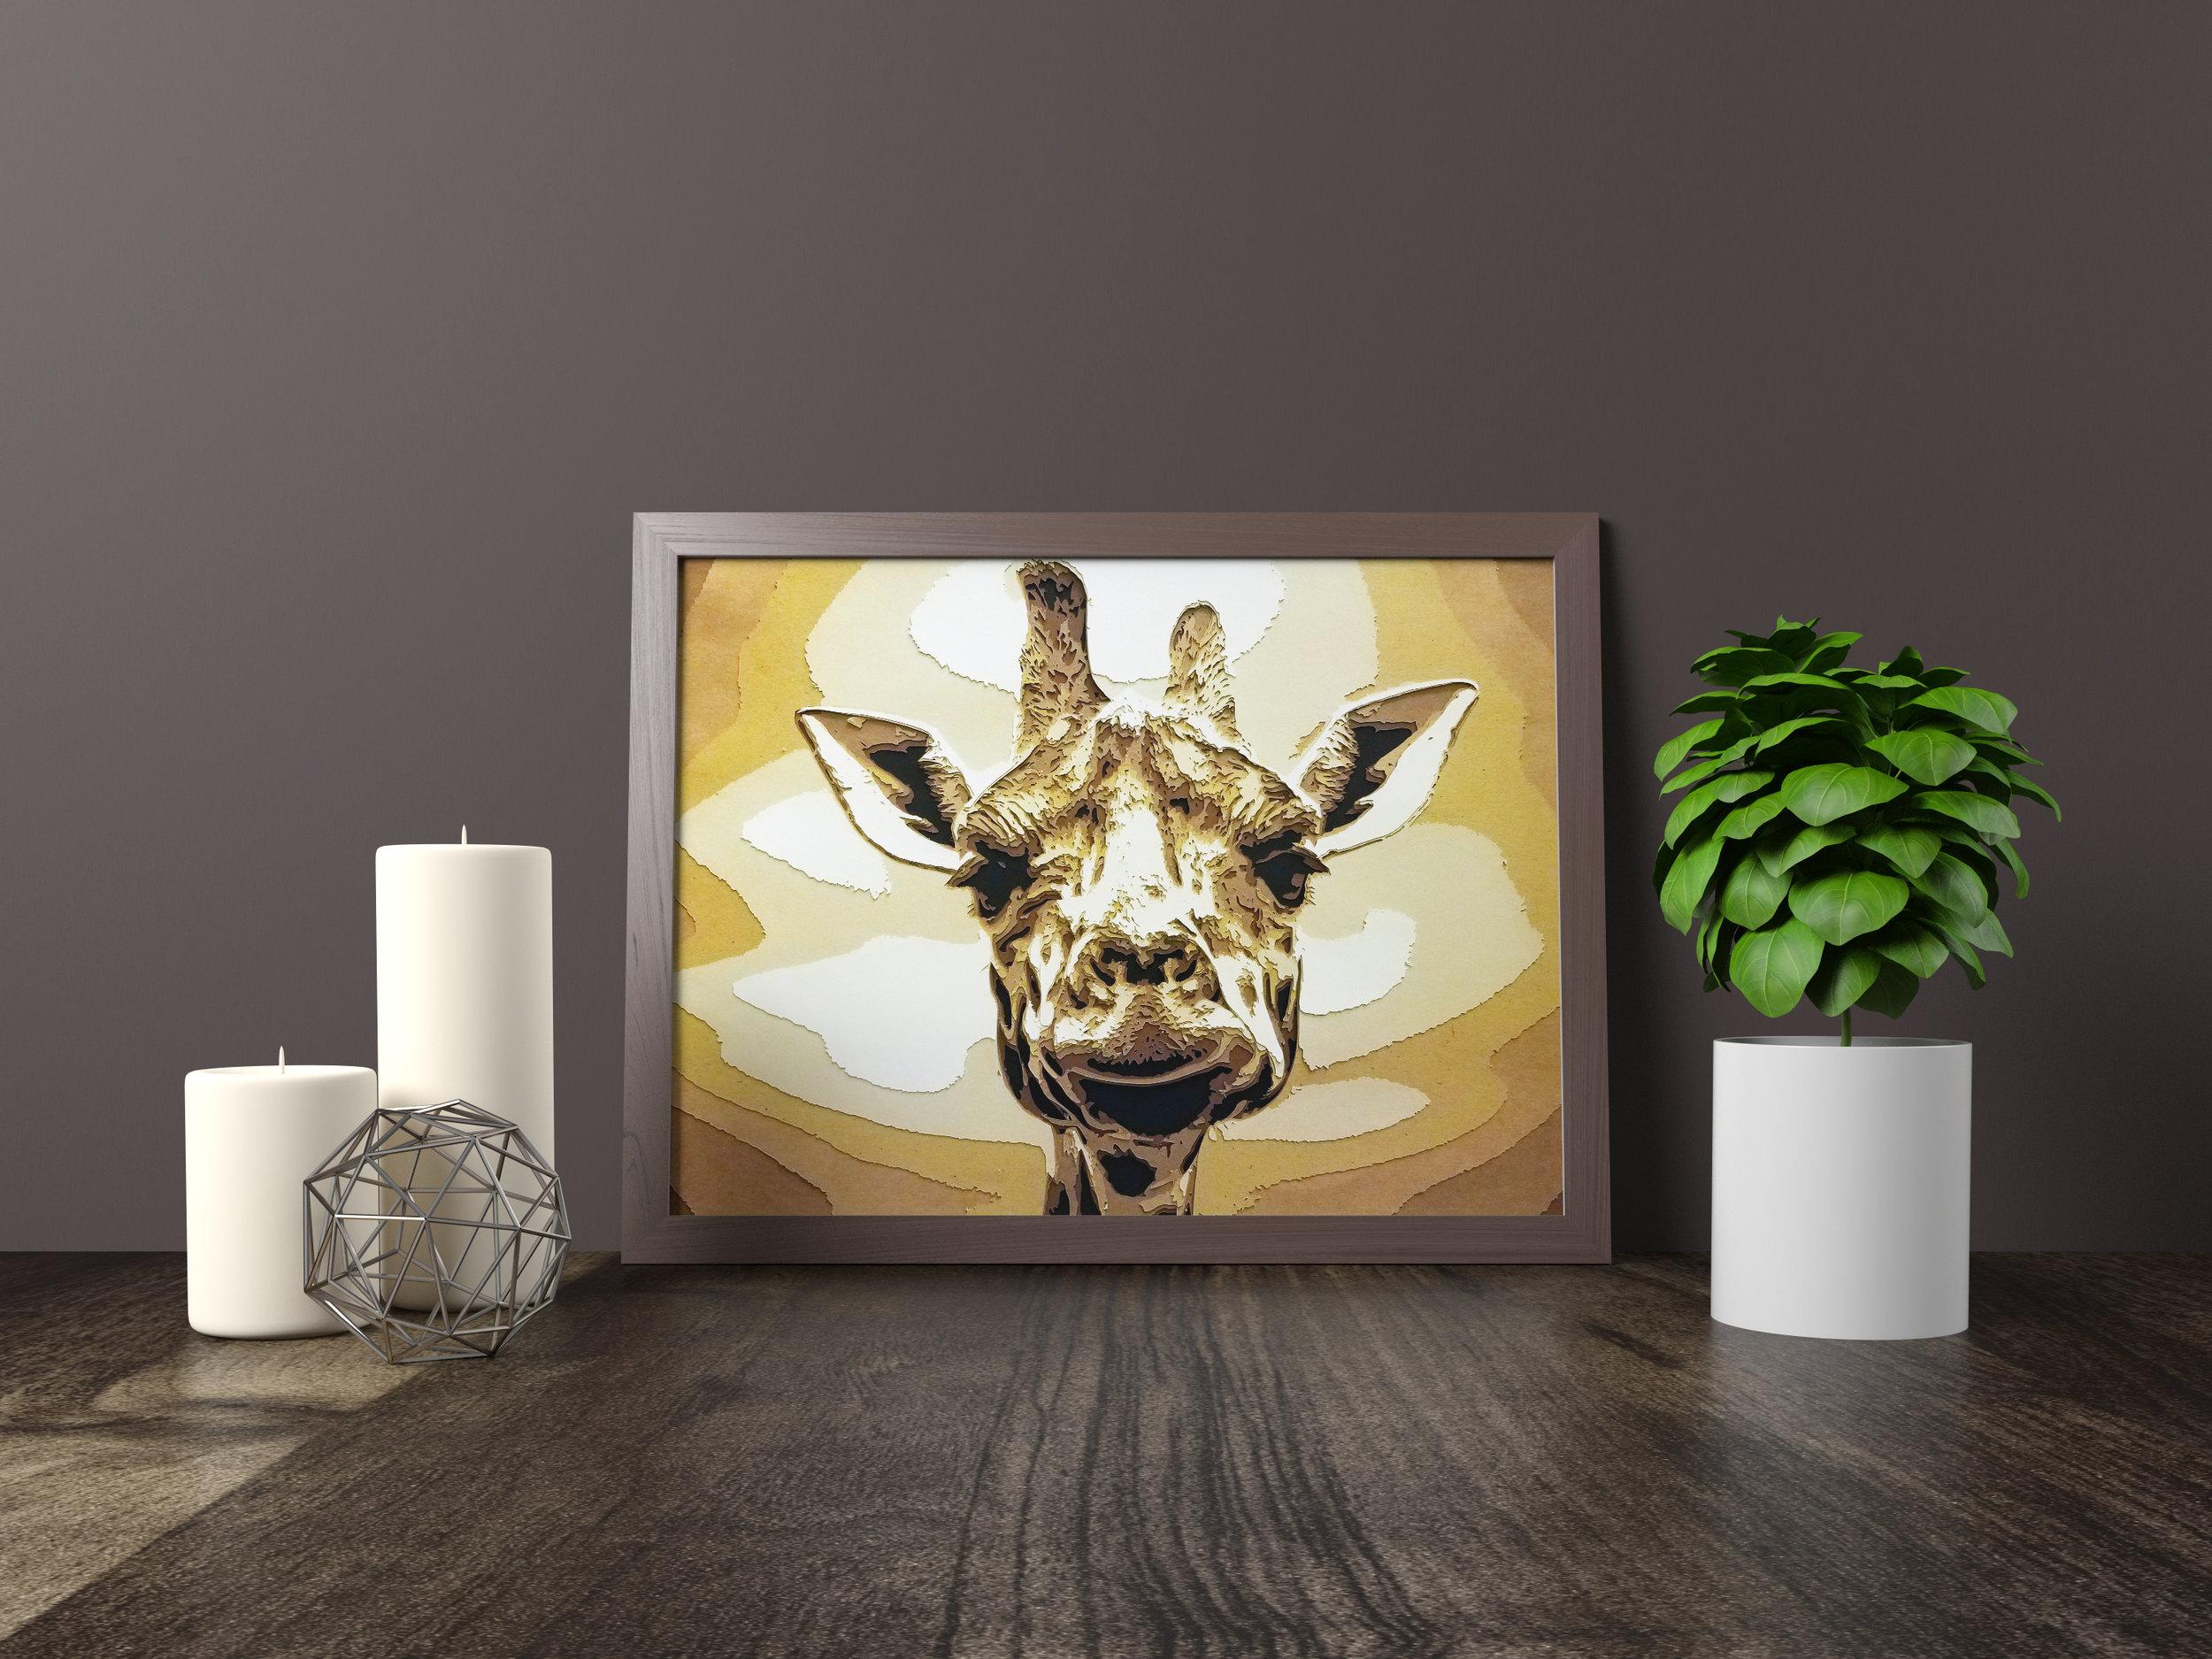 Stand Tall Giraffe - Winner - Award of Excellence, Association of Nebraska Art Clubs, 2018Winner - Honorable Mention, Omaha Artists, Inc. The Artful Letter Art Show, 2018Original artwork *FOR SALE* 11